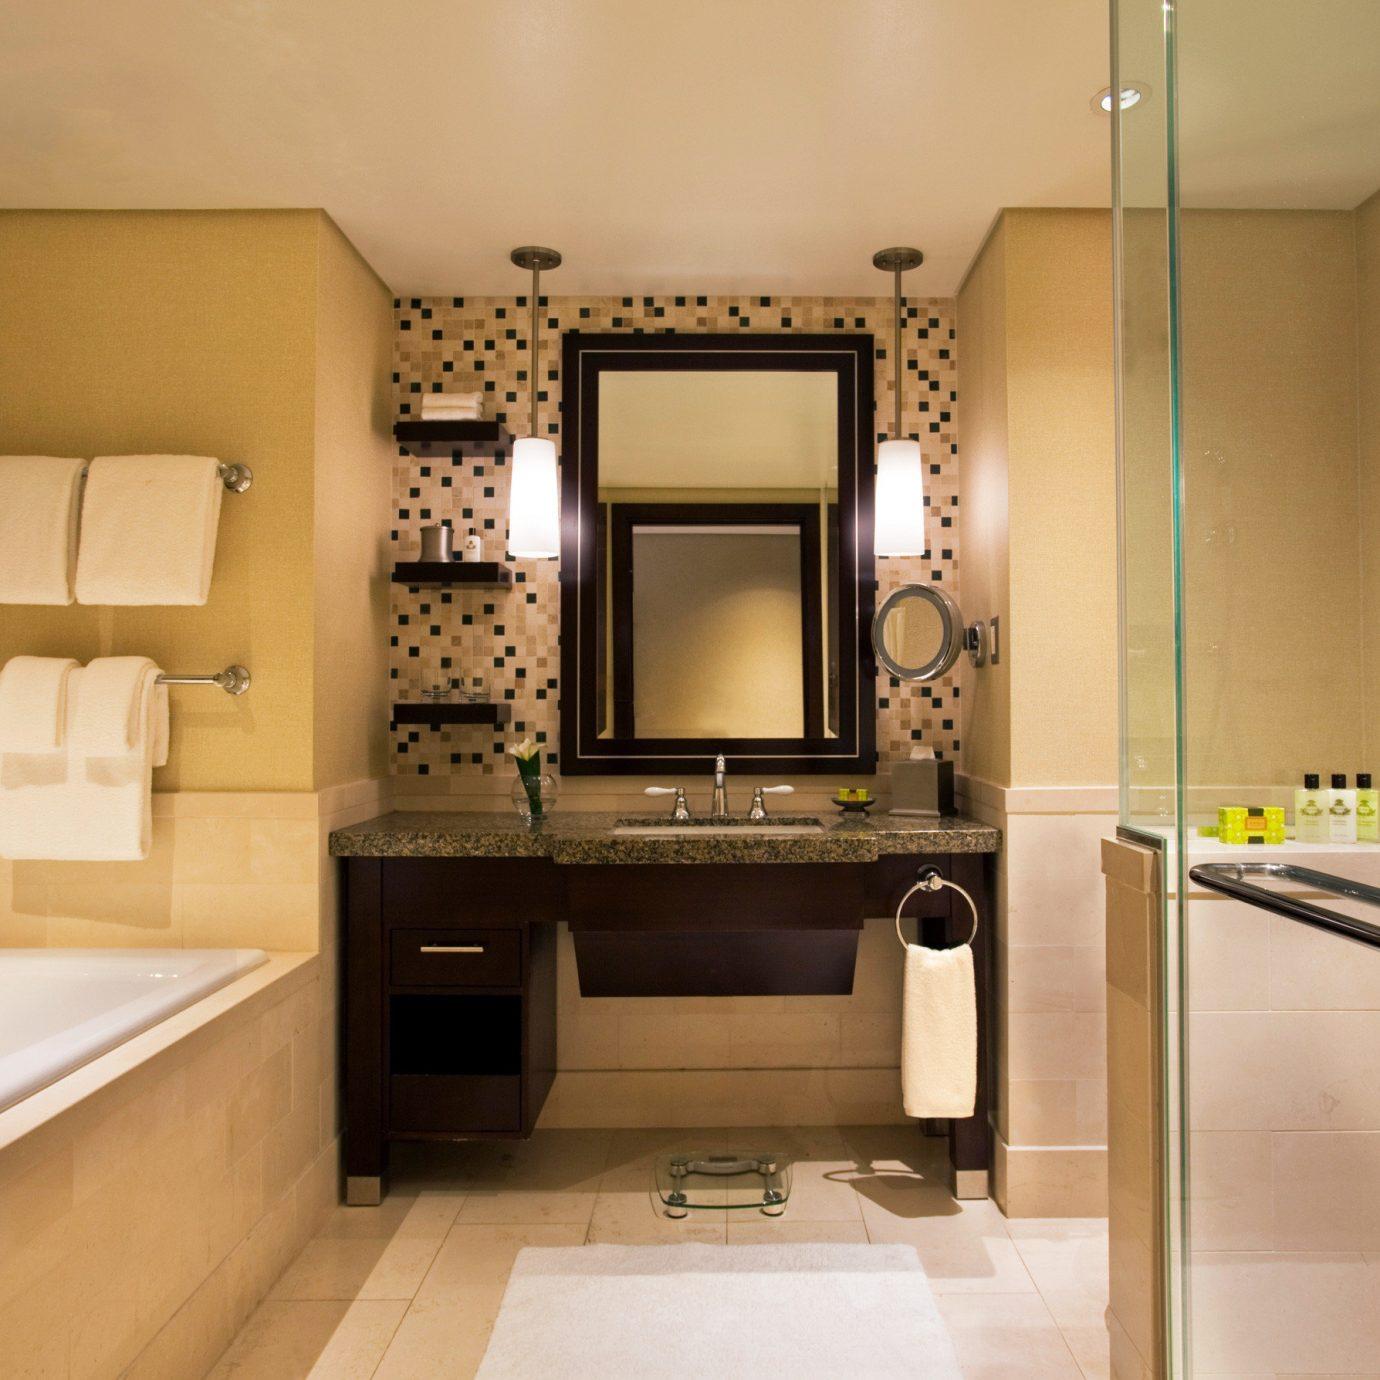 Bath City Classic Resort bathroom property home sink cabinetry Kitchen hardwood living room flooring cottage countertop Modern clean tub